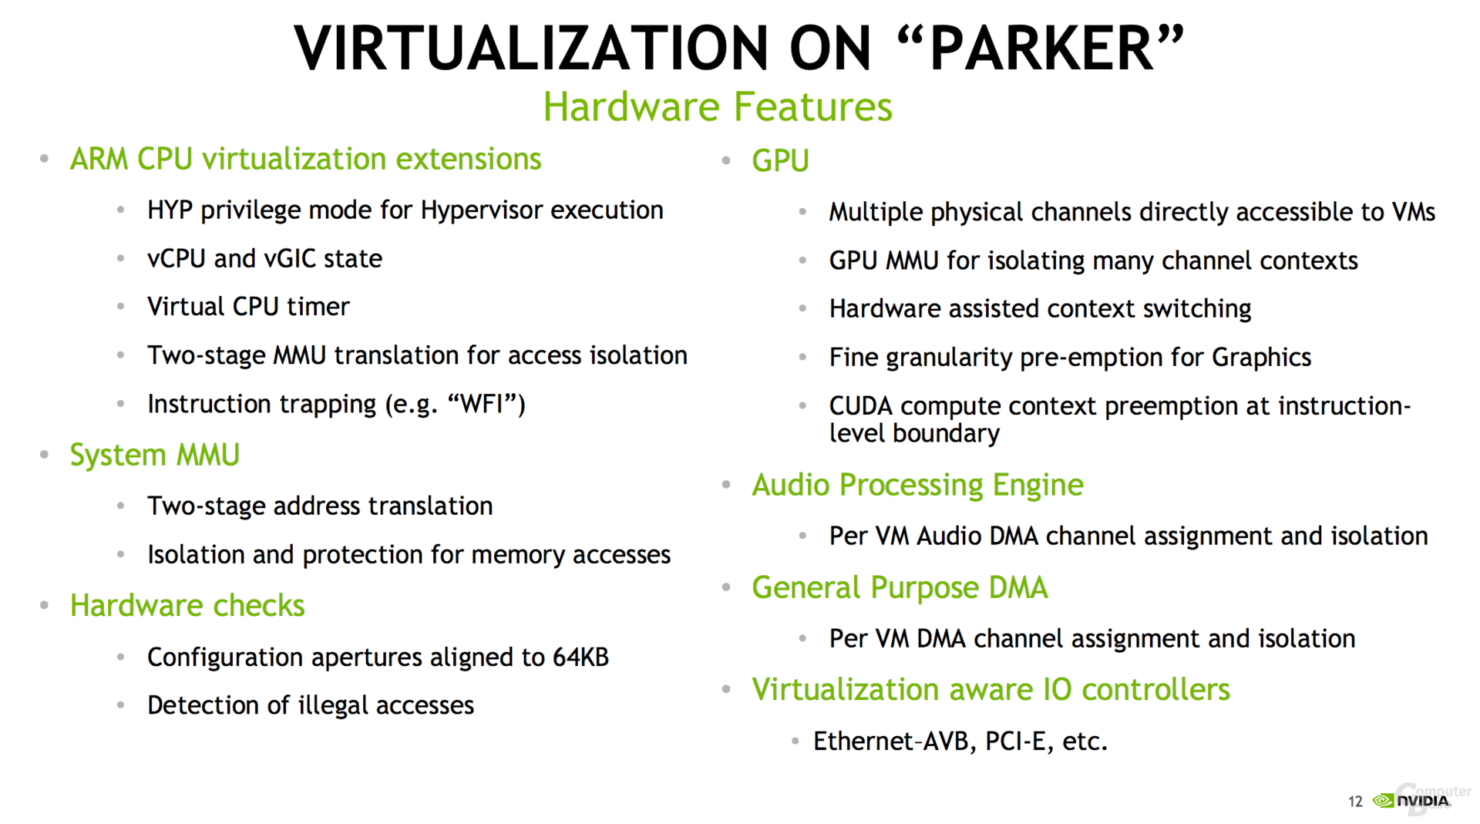 nvidia-tegra-parker-soc_hardware-features